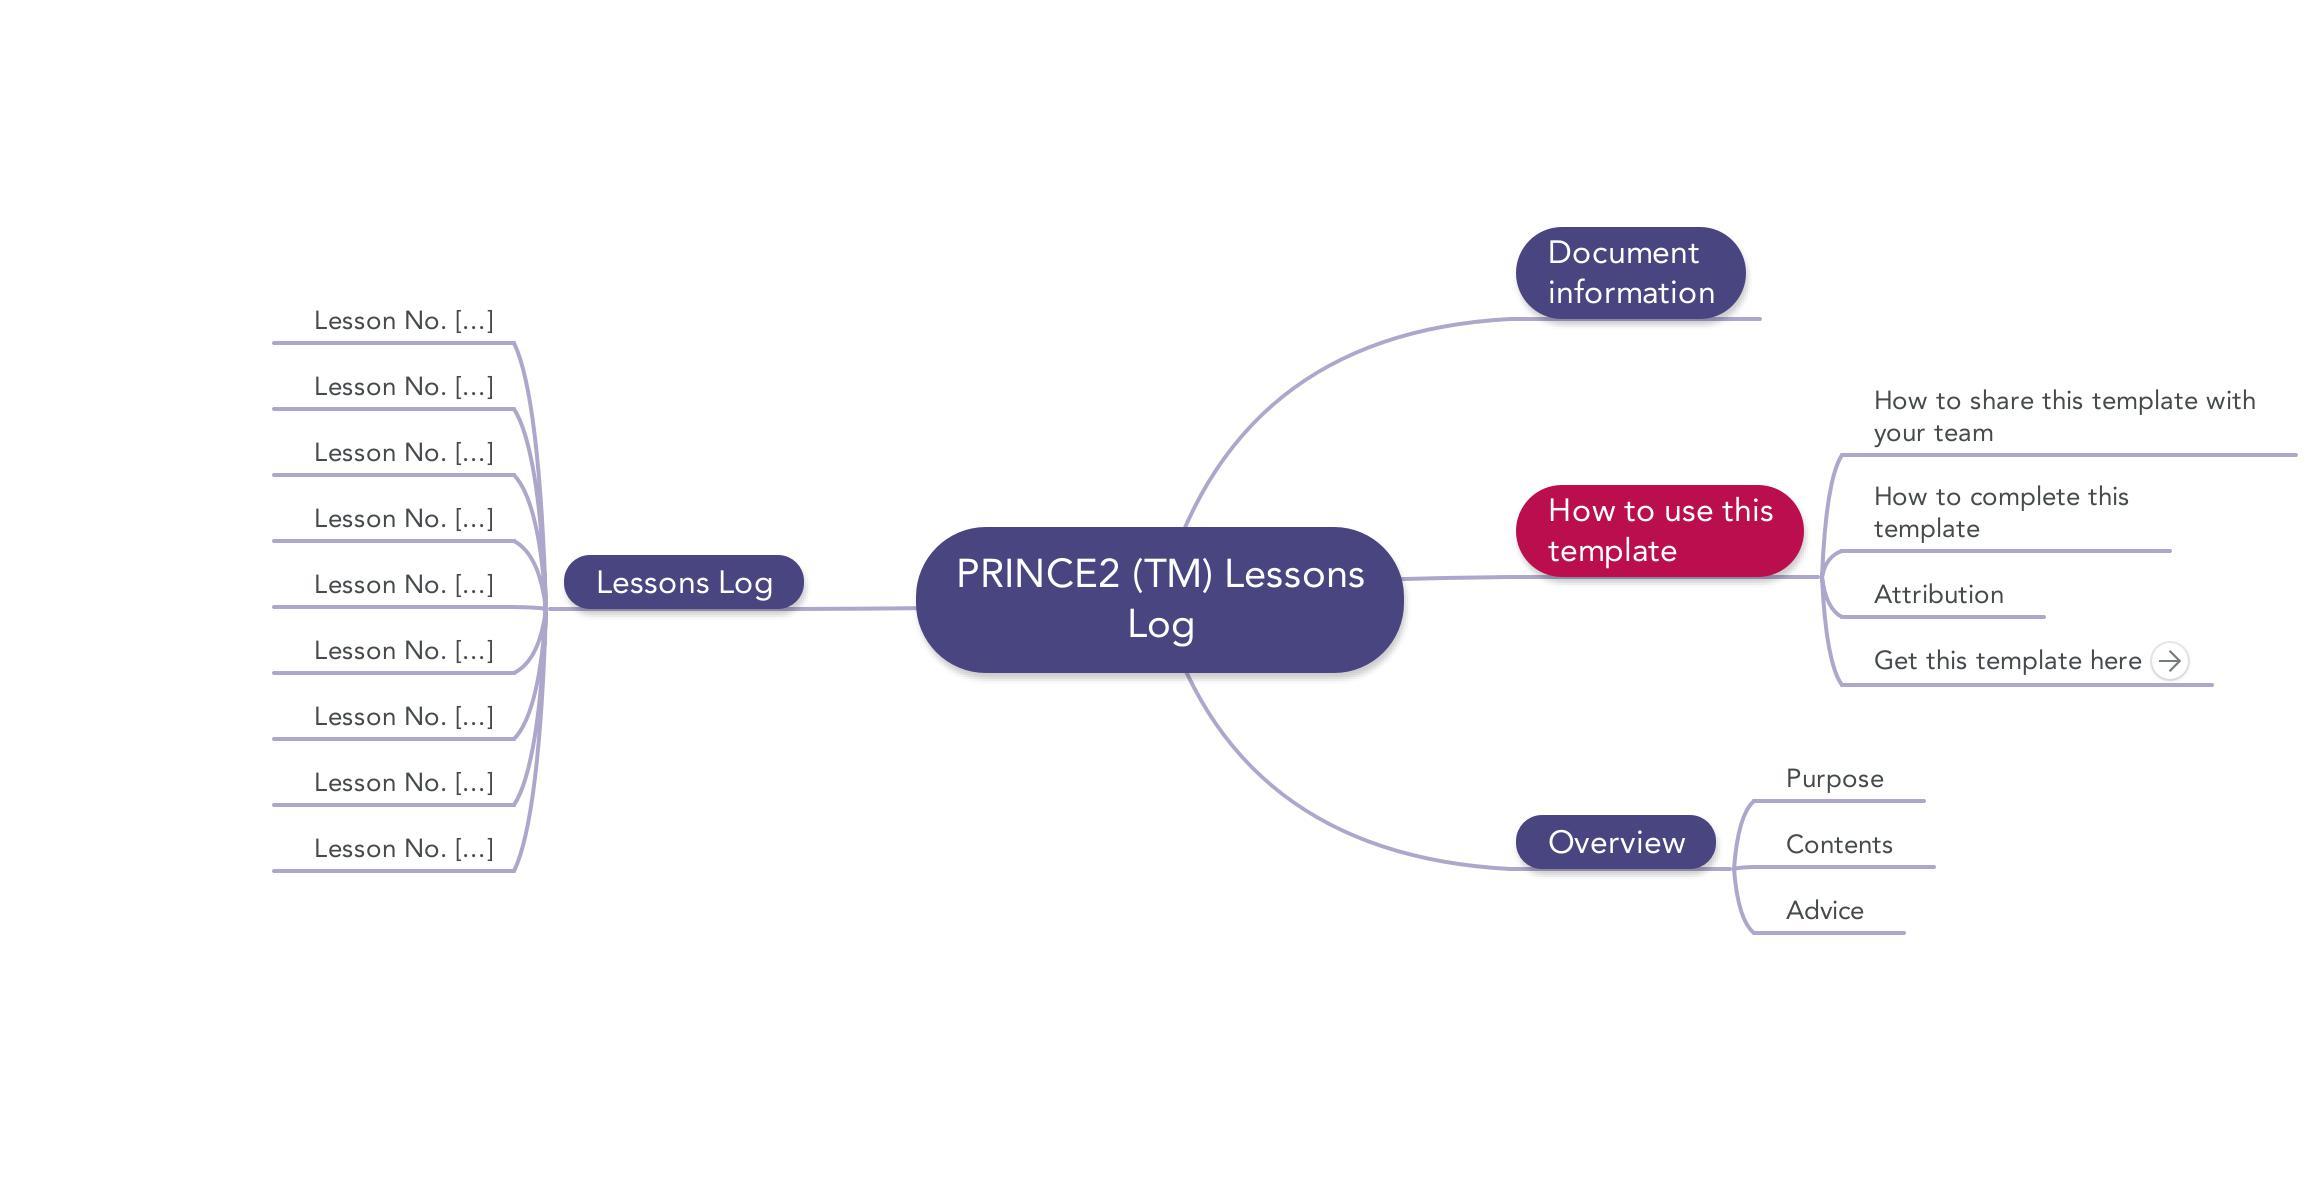 Prince2 Lessons Log